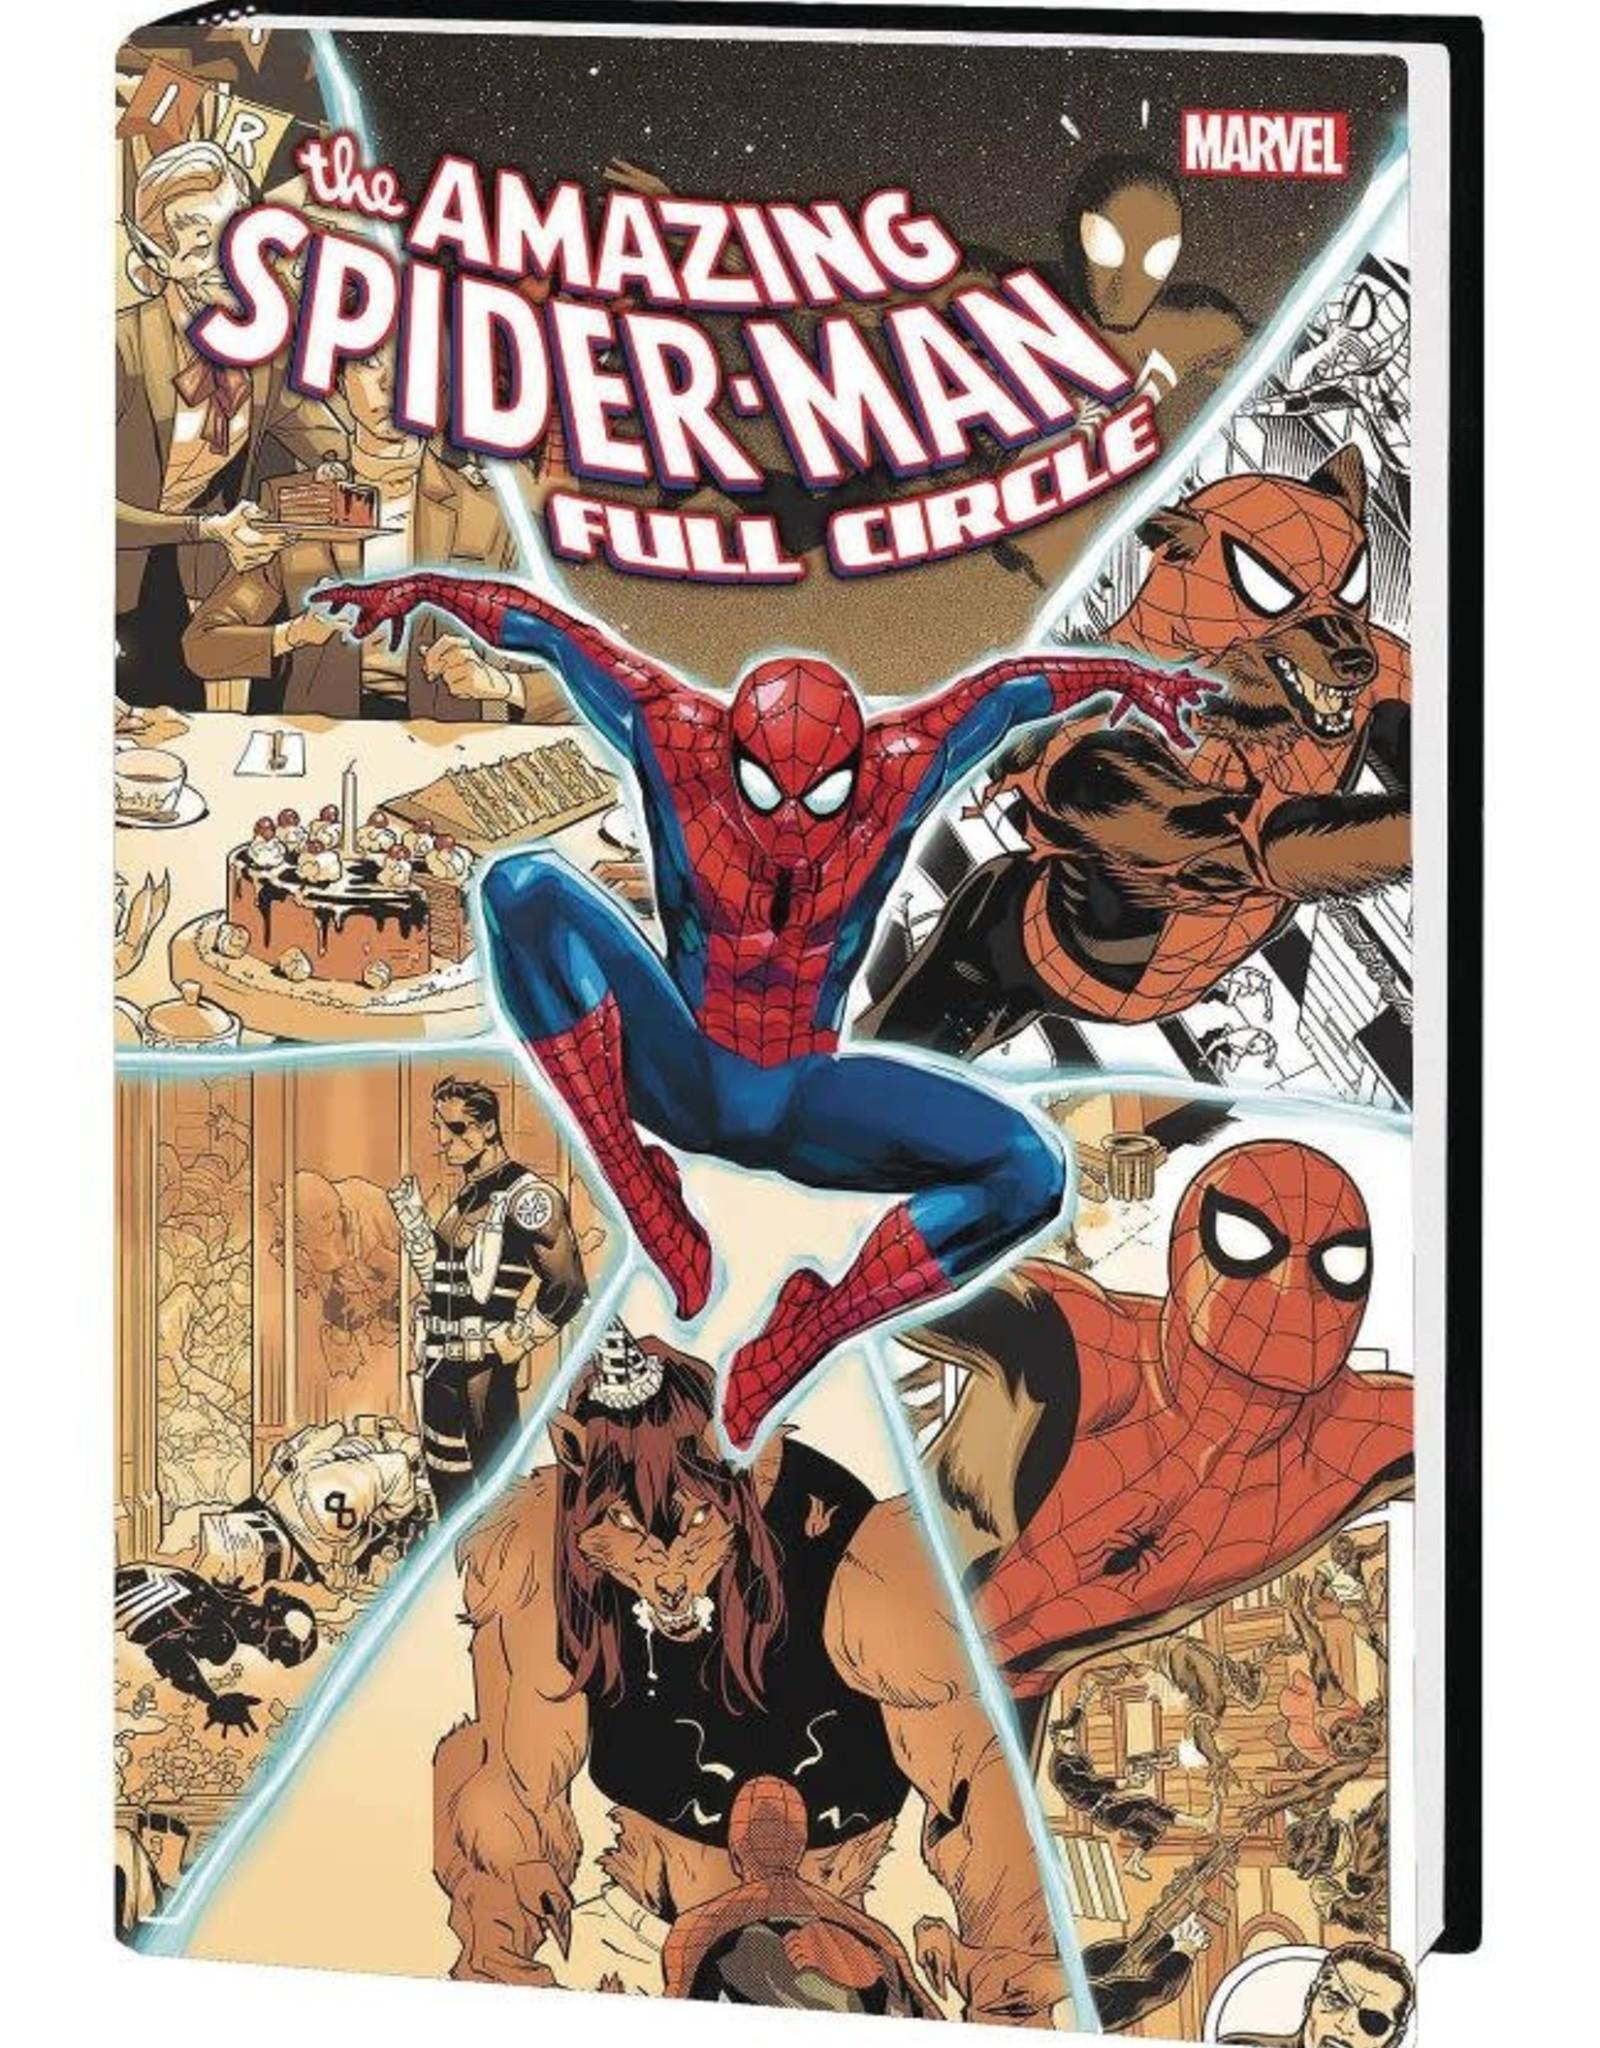 Marvel Comics Amazing Spider-Man Full Circle HC